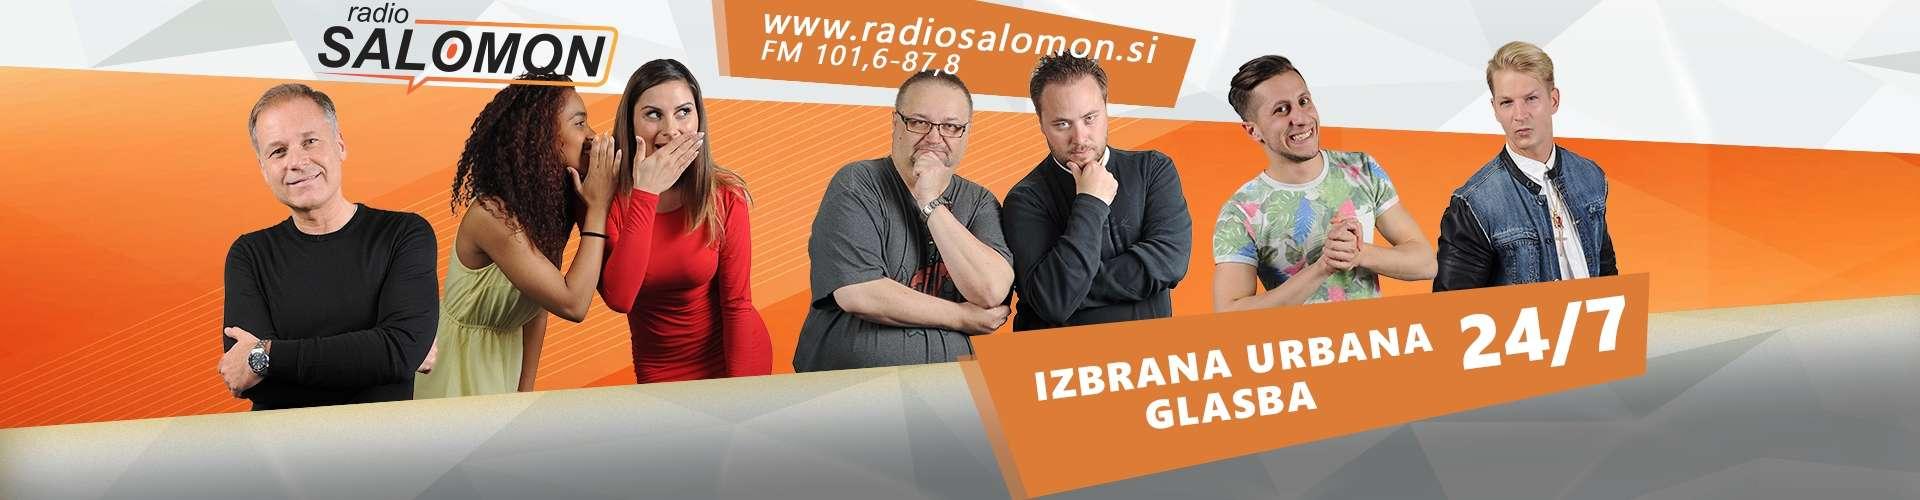 Naslovnica Radio Salomon Ekipa